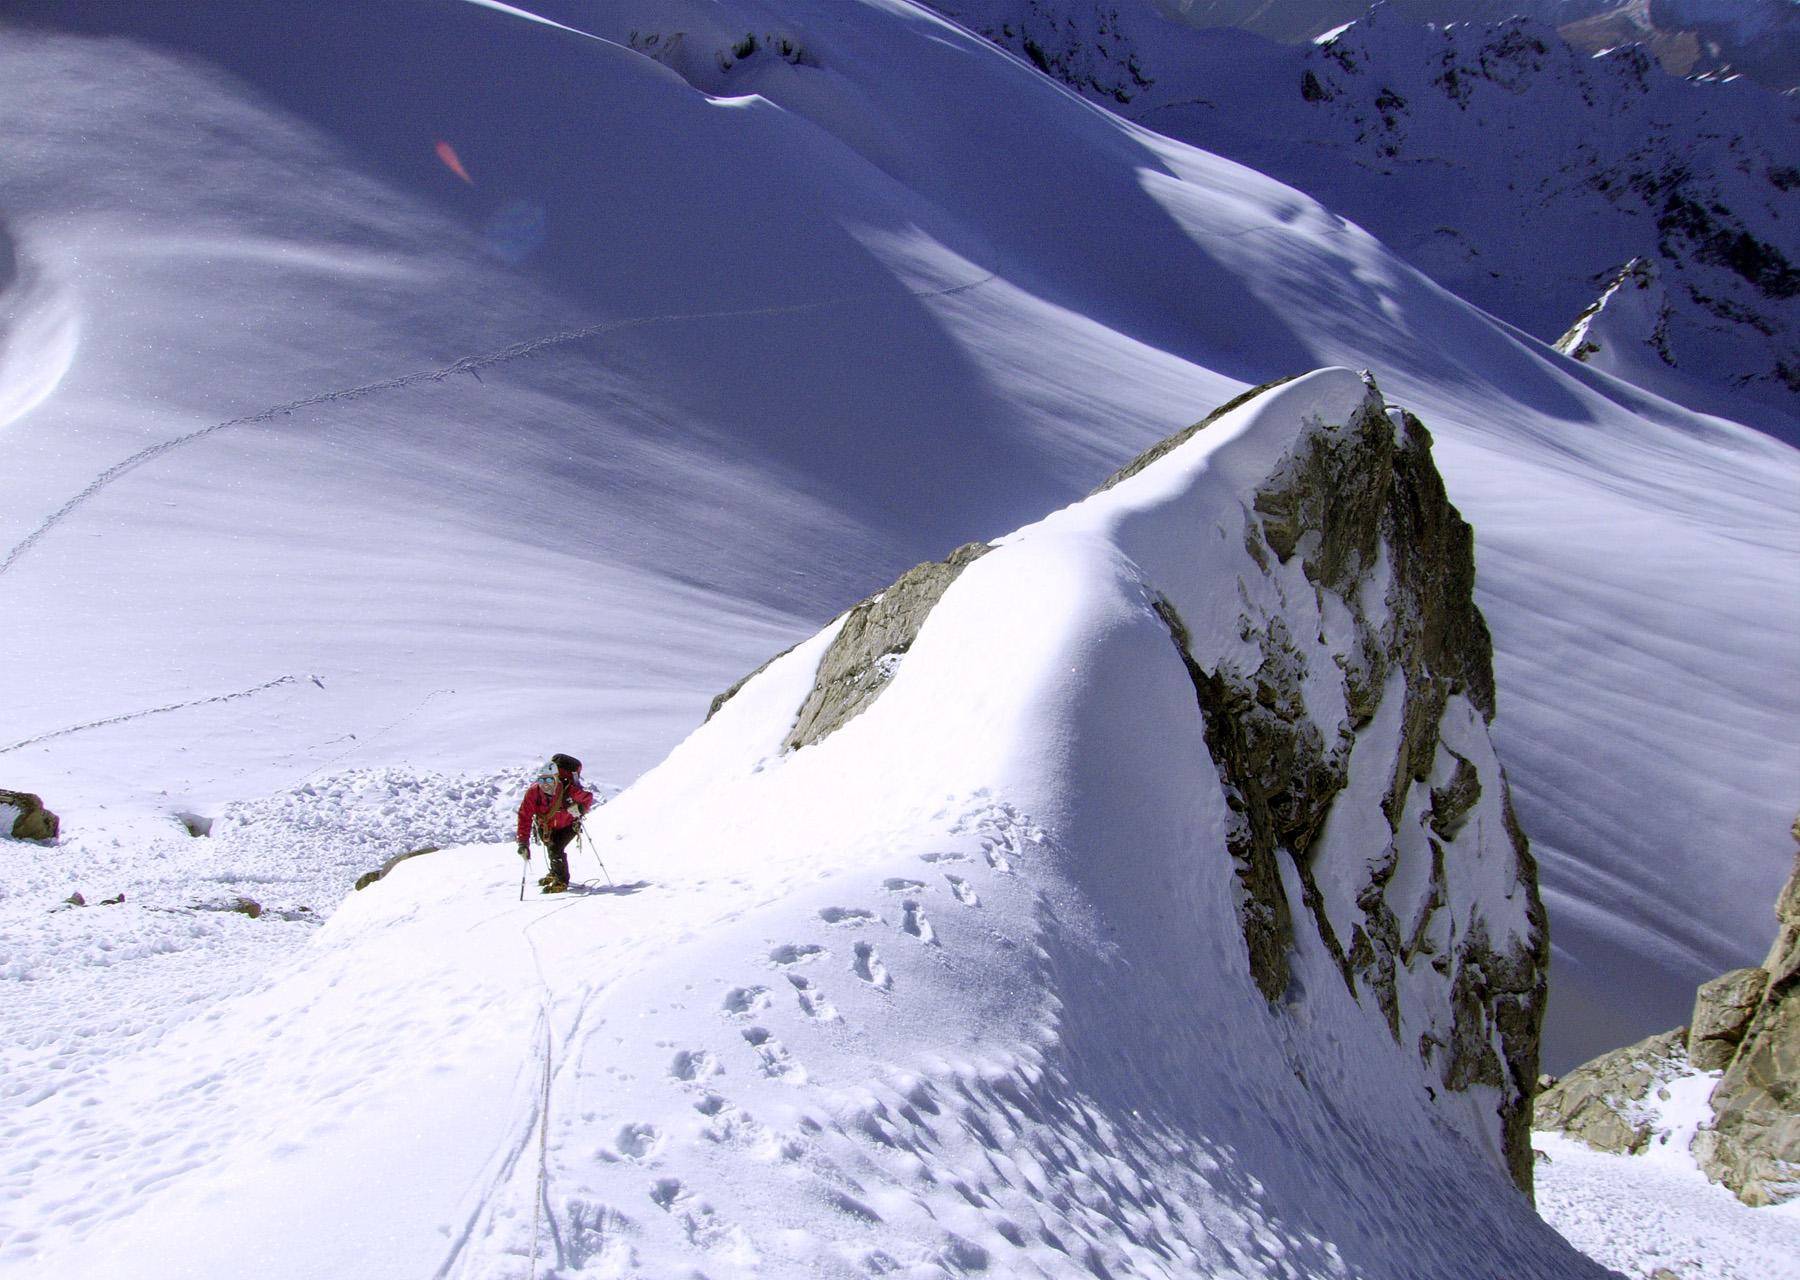 Mike Cocker on Snow Leopard Peak. Derek Buckle